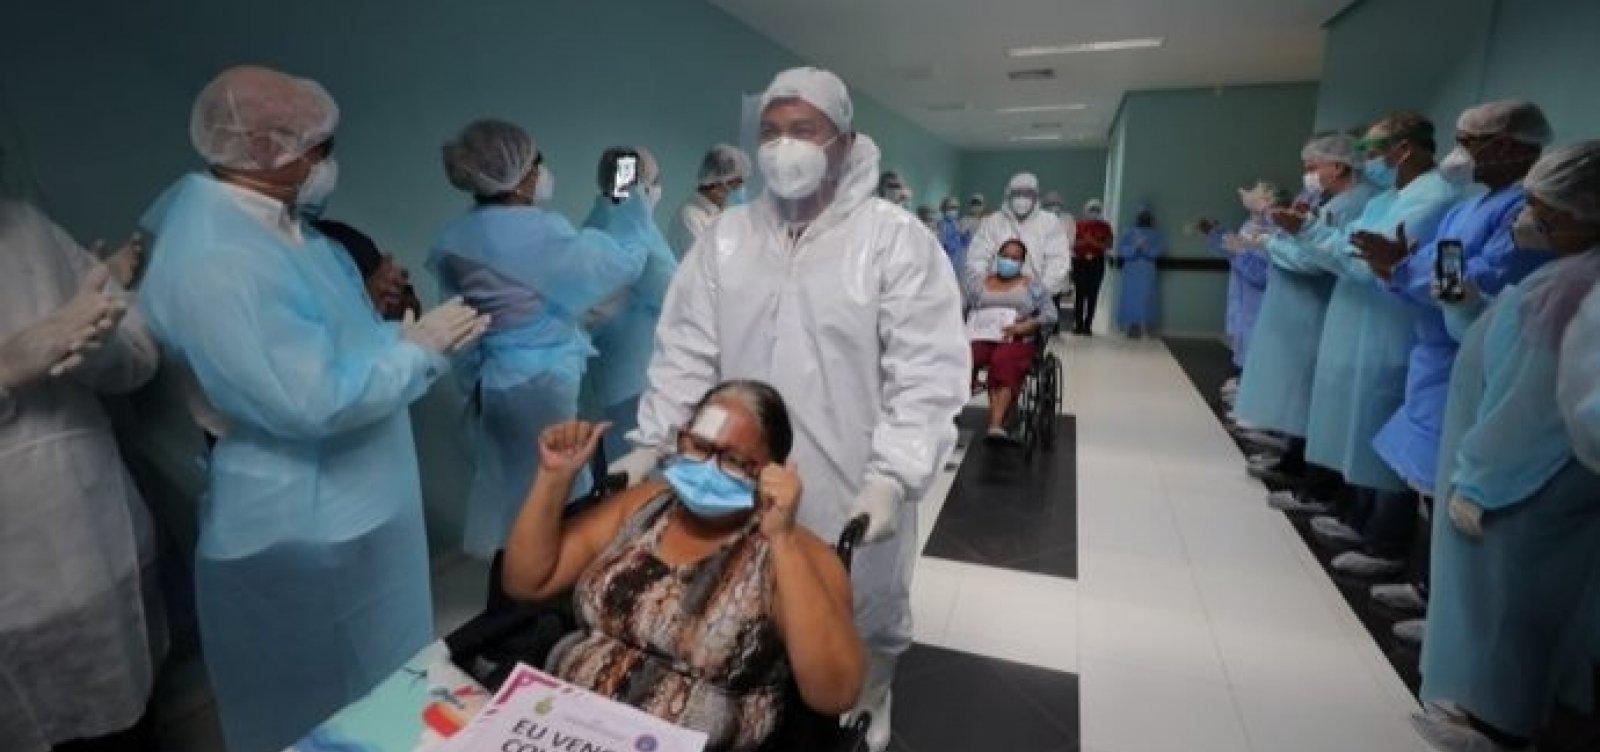 Bahia registra nesta quinta menor número de casos ativos de coronavírus desde janeiro